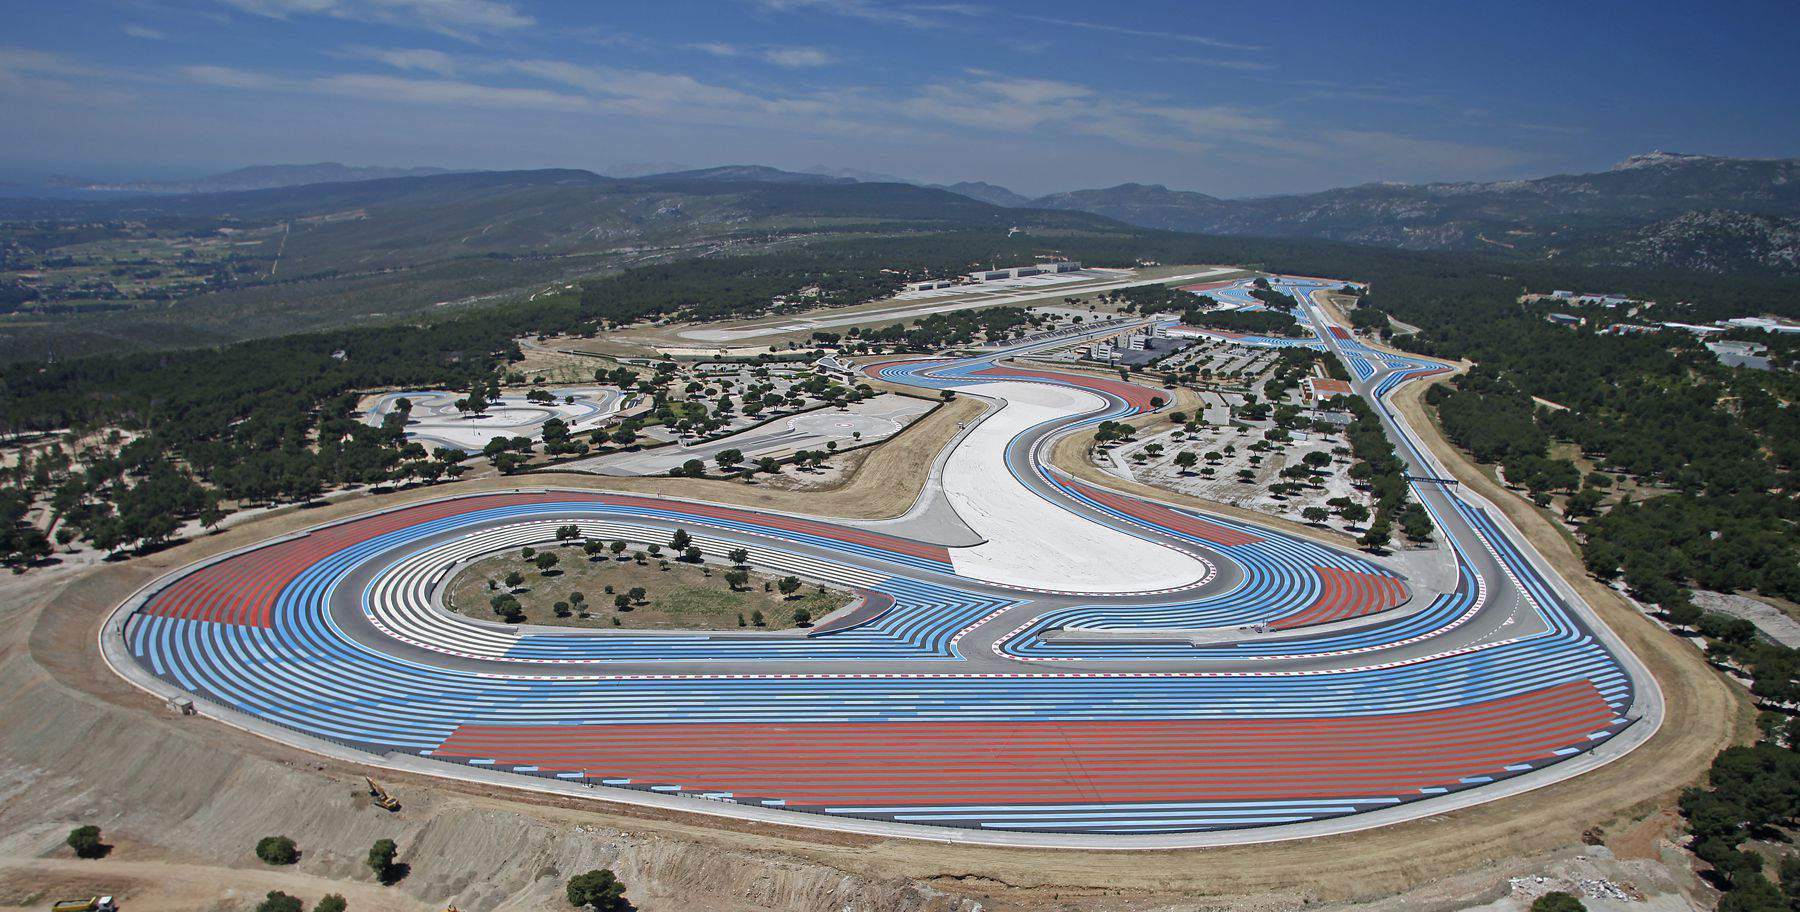 image from Гран При Франции 2021